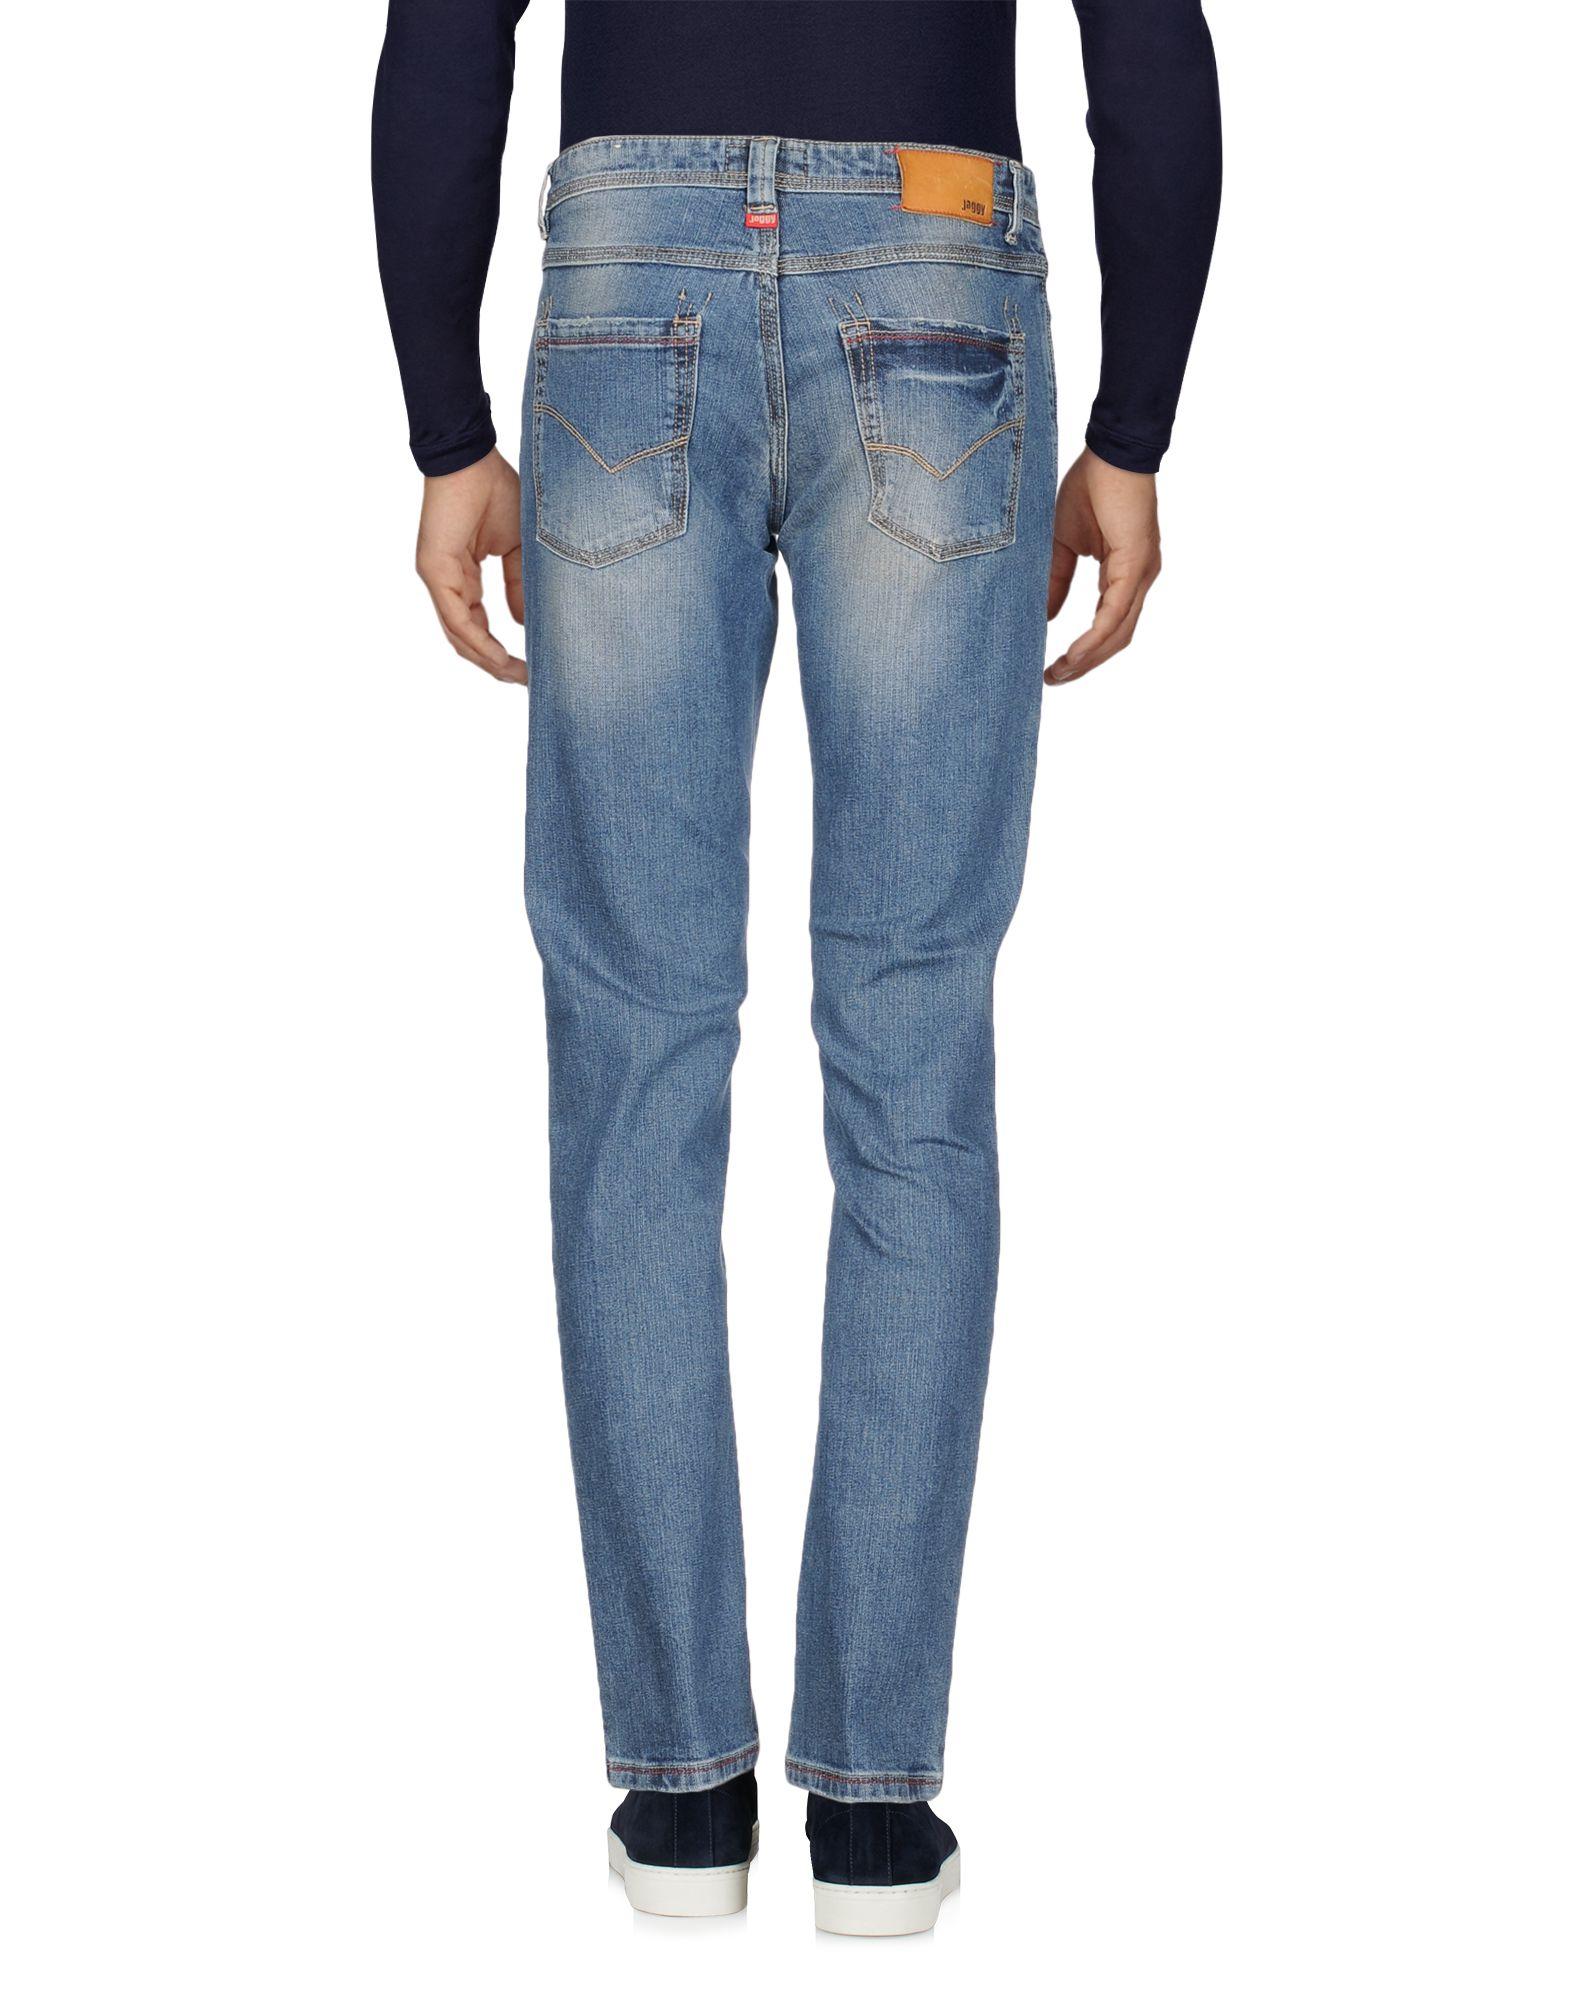 Pantaloni Jeans Jaggy 42682147HL Uomo - 42682147HL Jaggy 29b43e